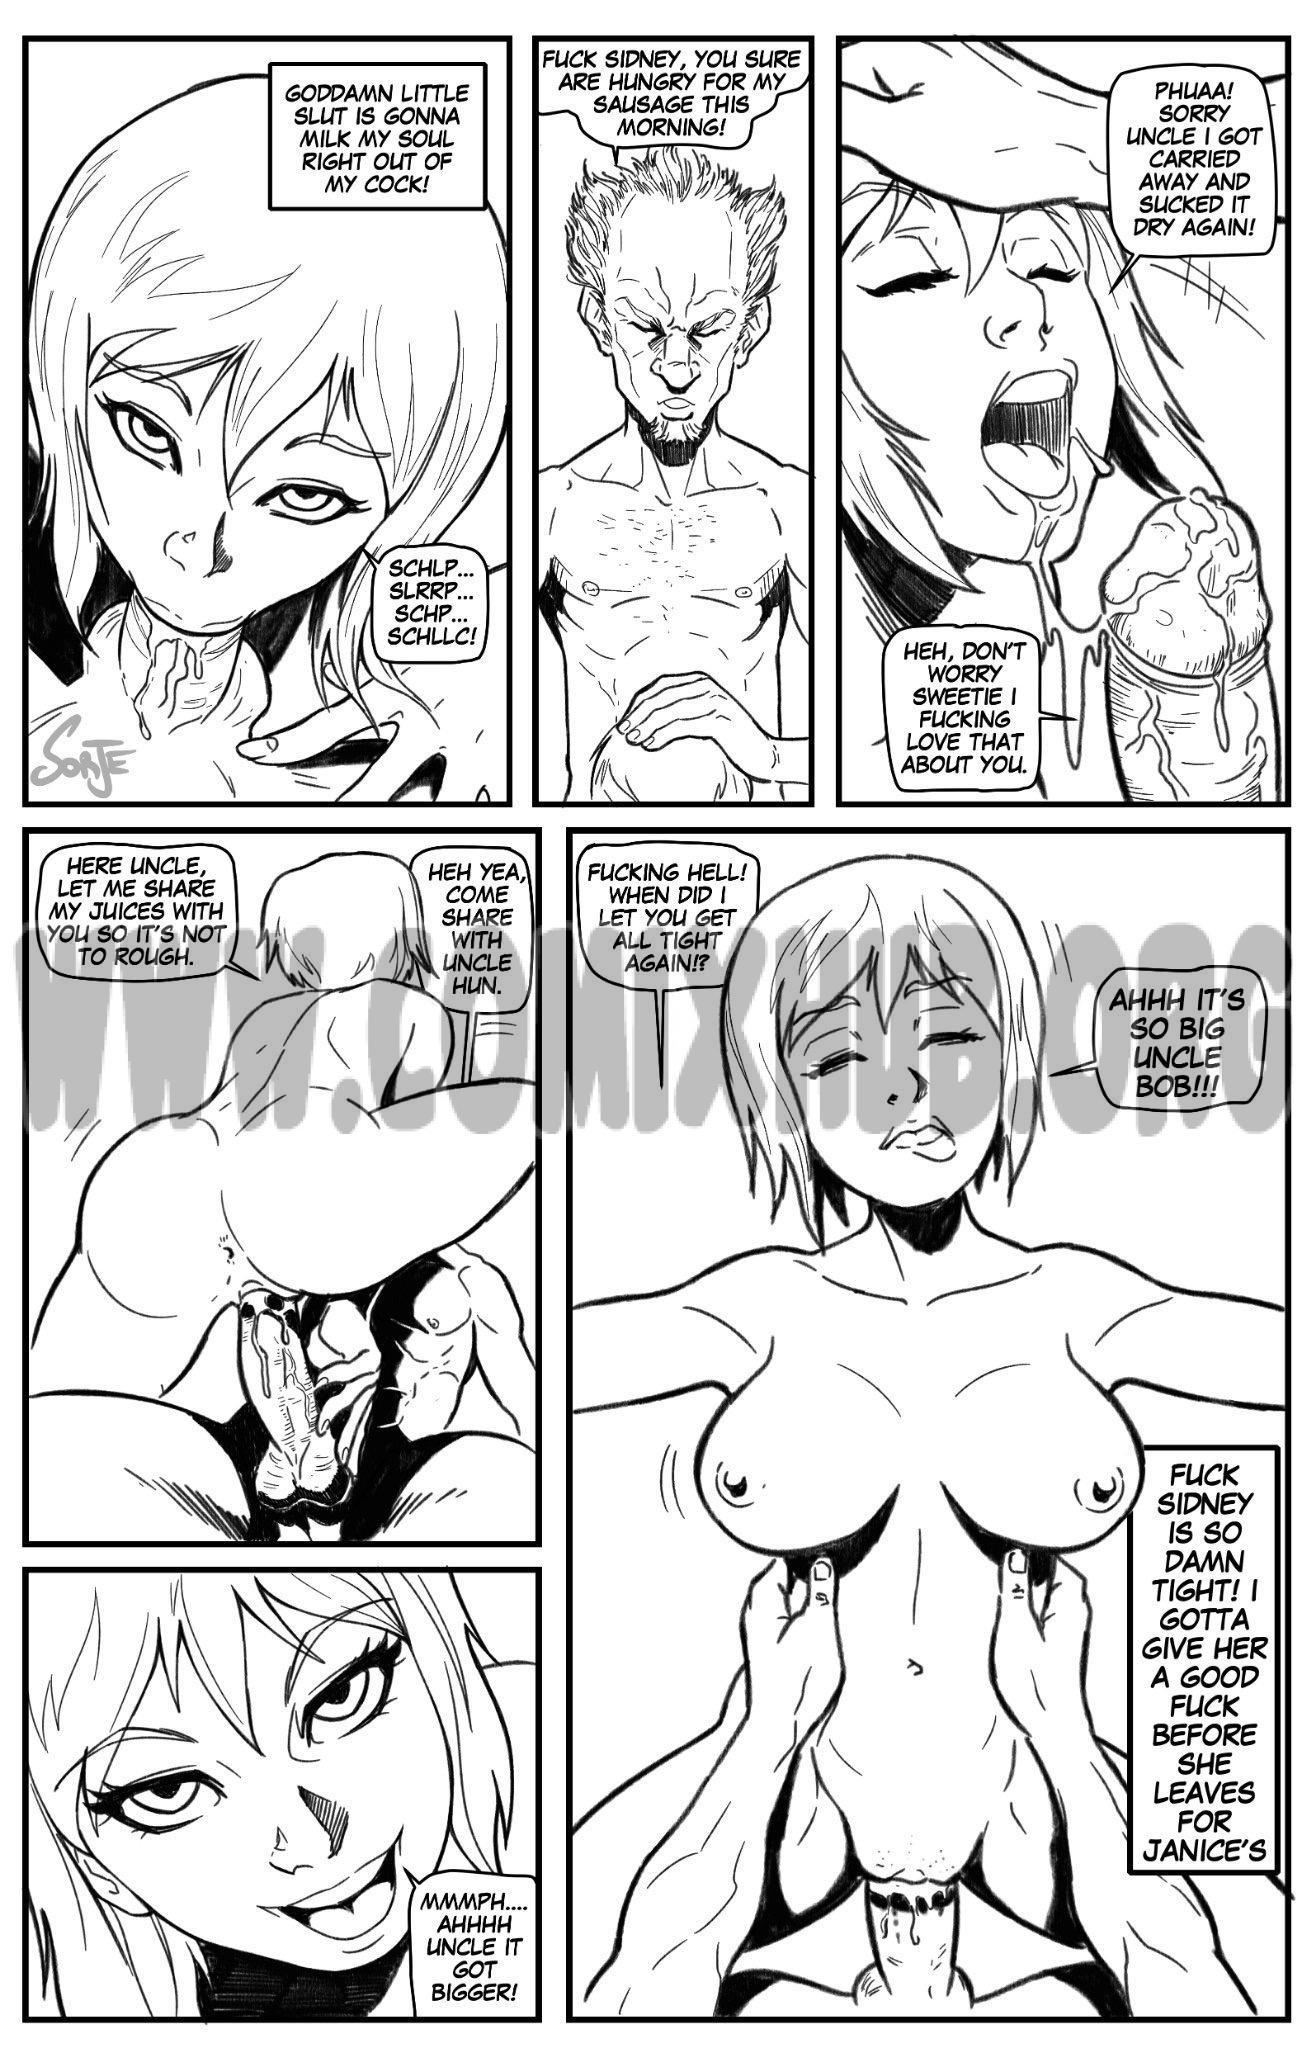 Sidney Fun In The Sun porn comics Oral sex, Blowjob, Creampie, Cum Shots, Cum Swallow, cunnilingus, Straight, Titfuck